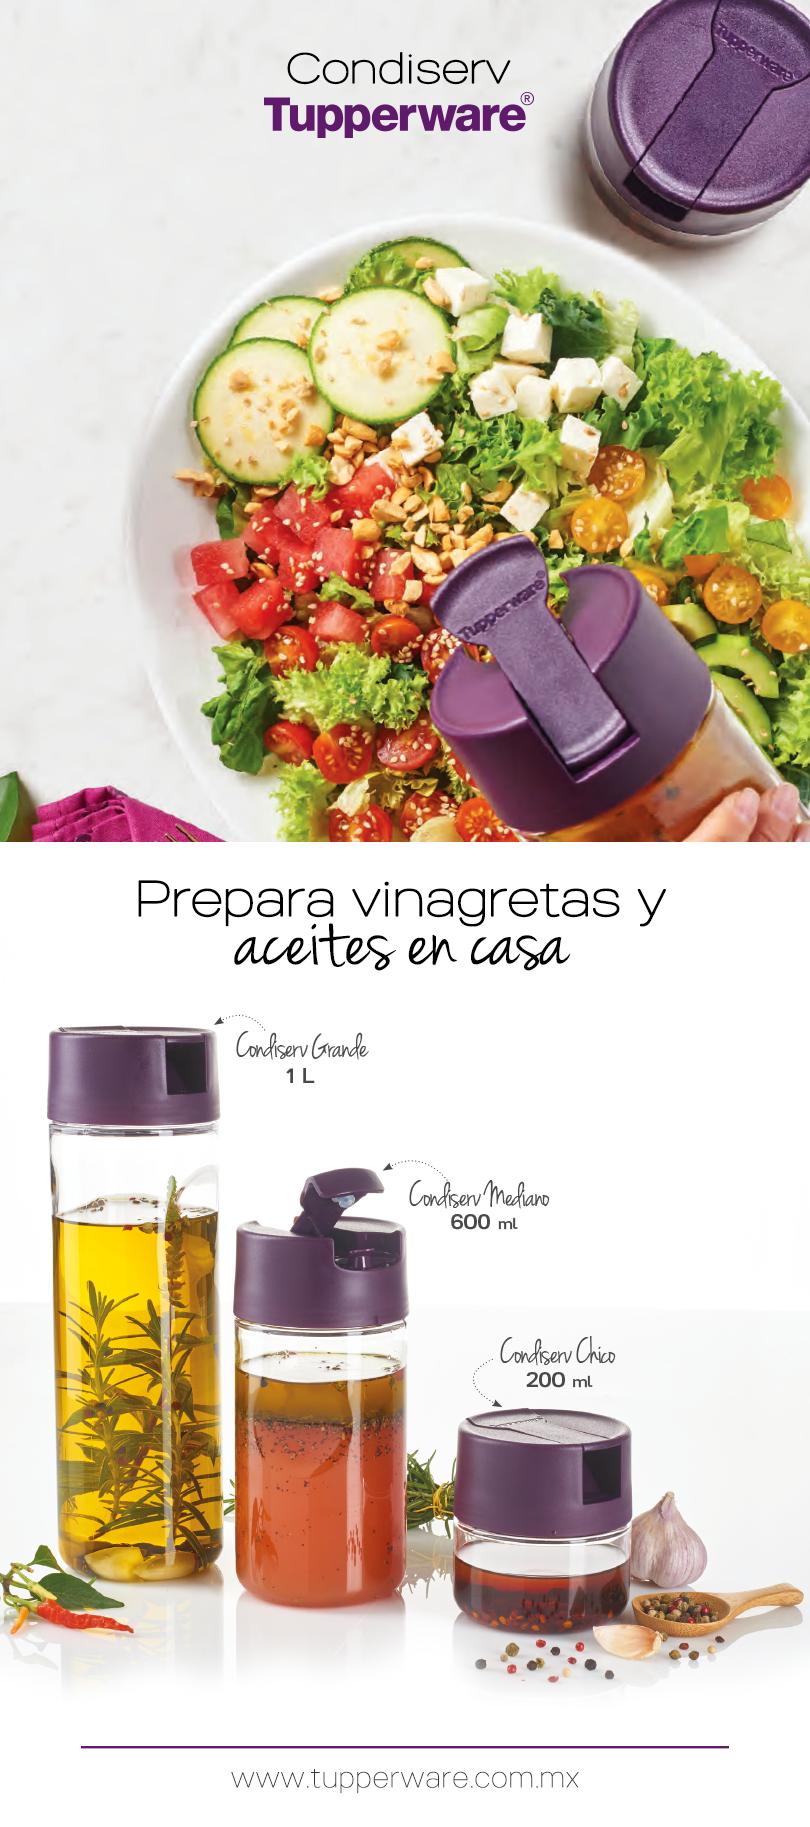 Condiserv Productotupperware Tupperware Mjg In 2018 Medium Summer Fresh Bolivia